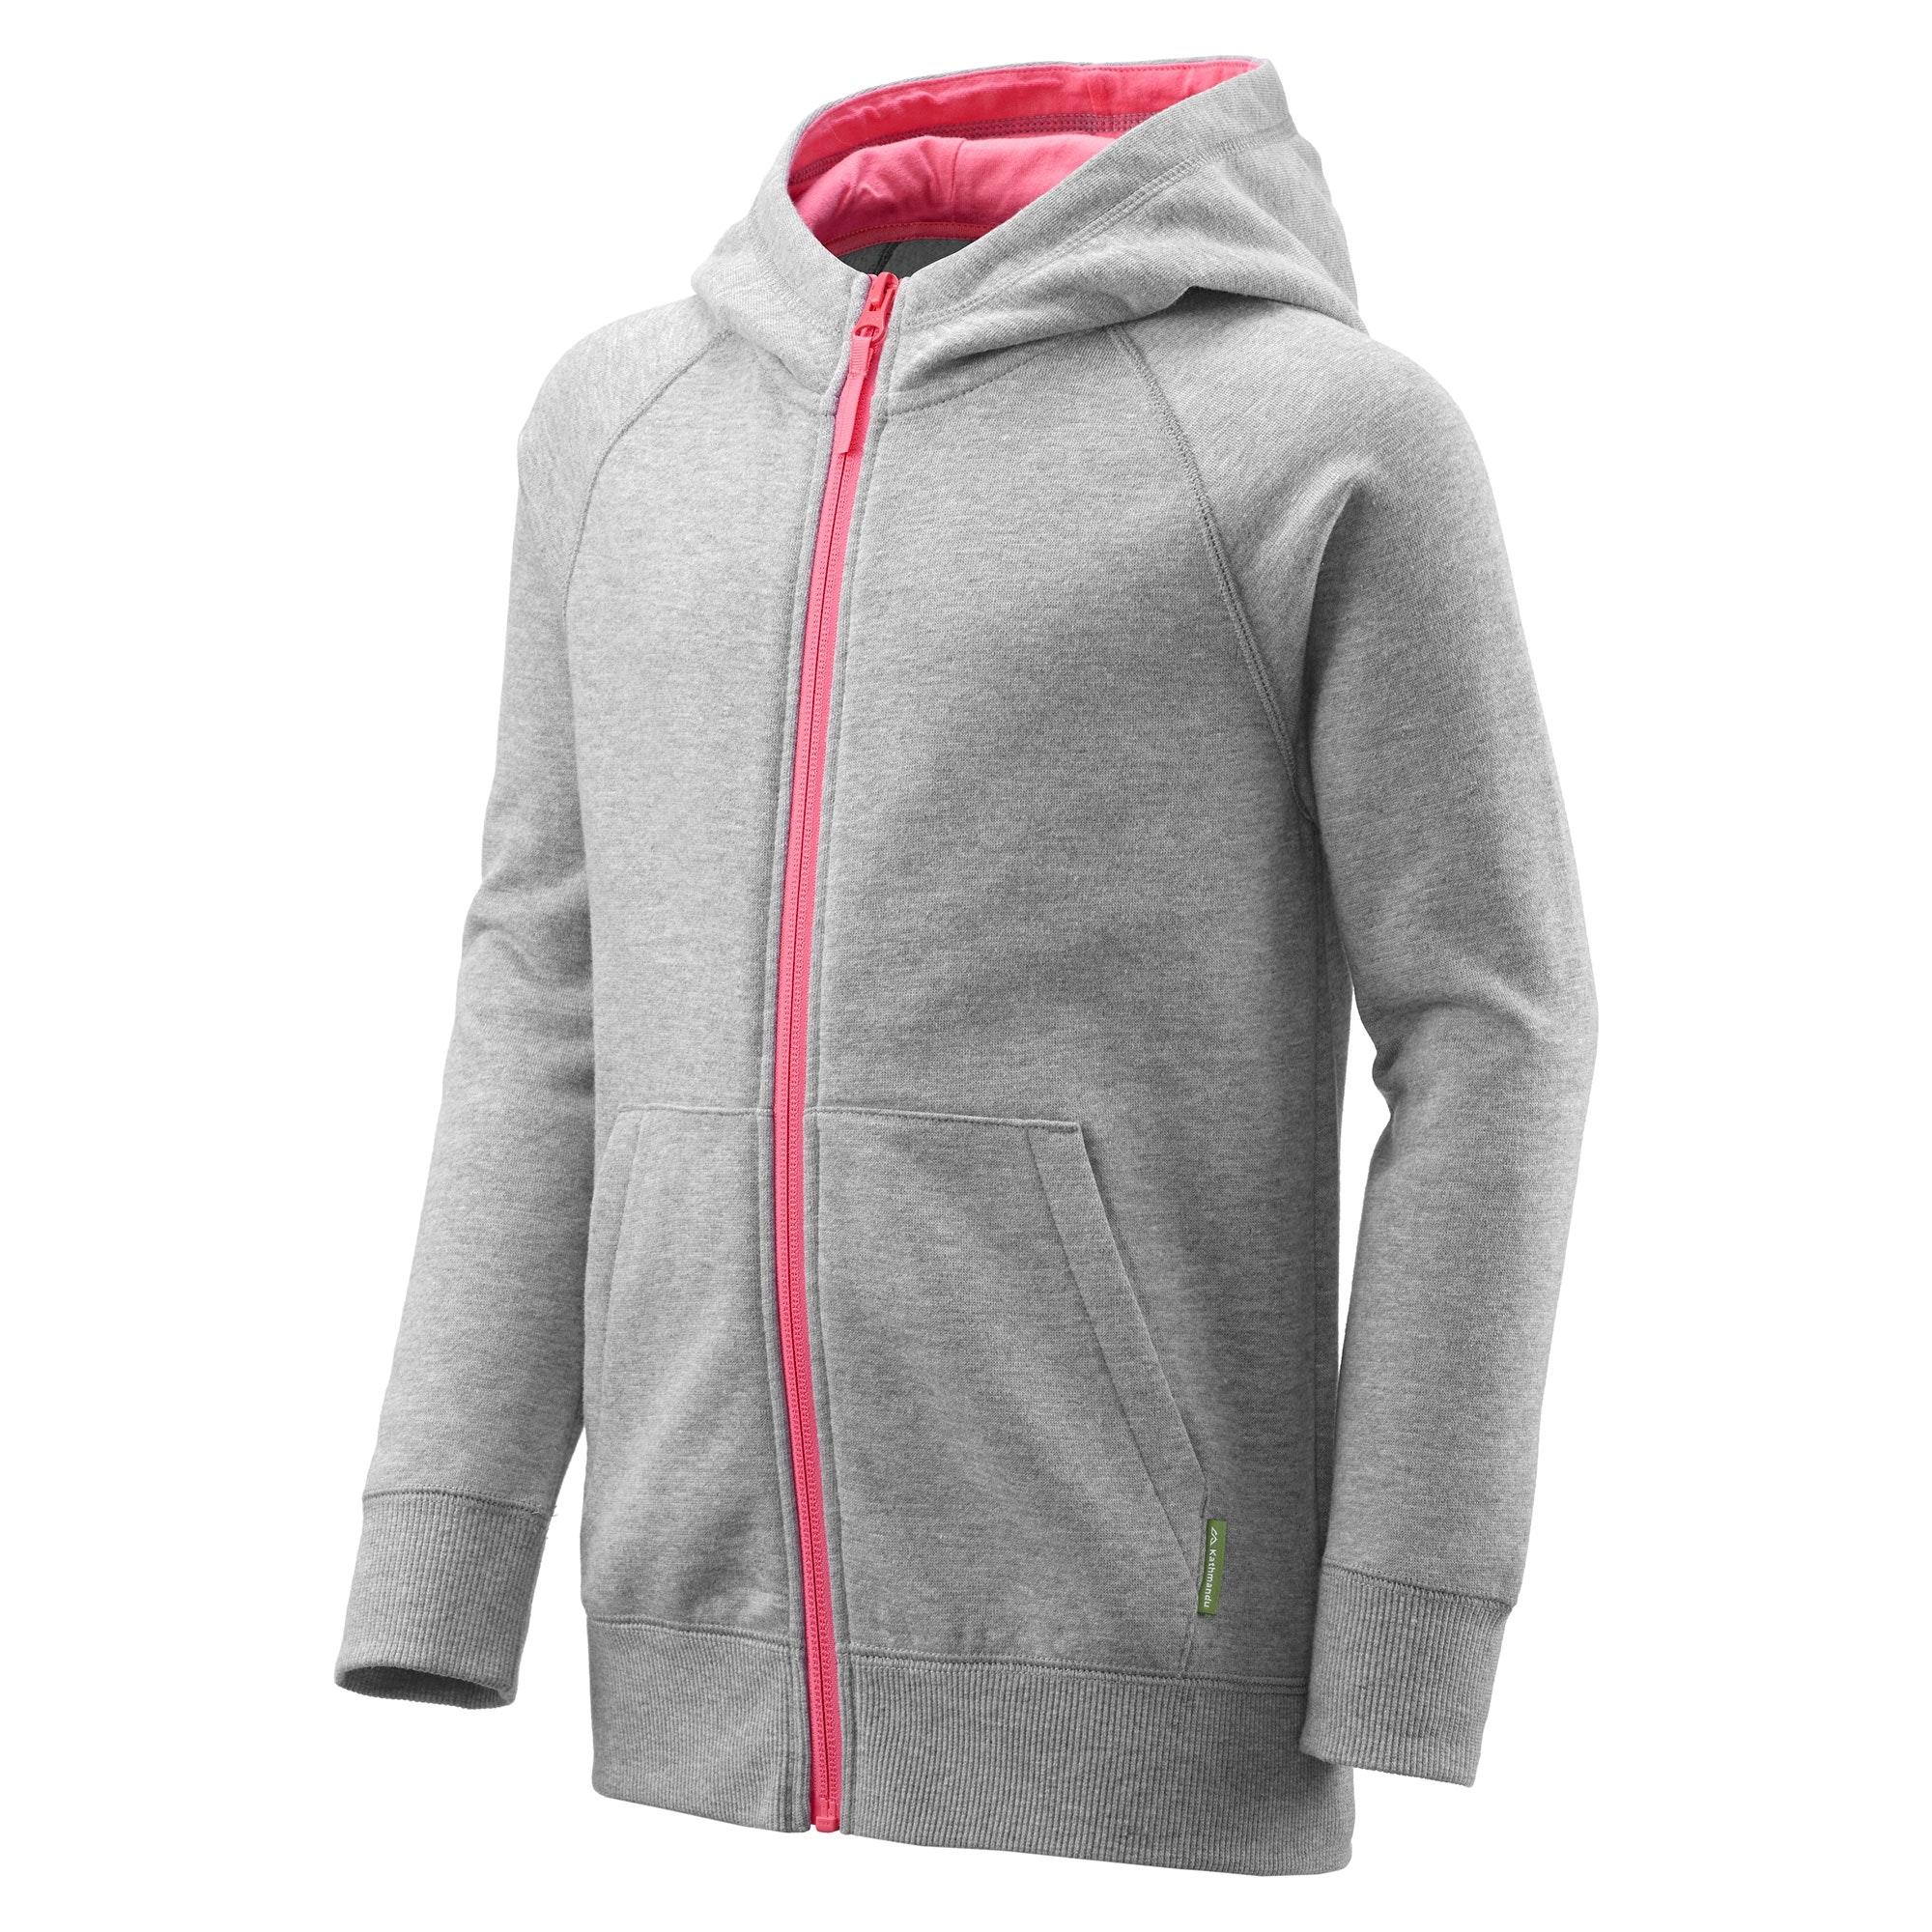 NEW-Kathmandu-Youth-Boy-039-s-Girl-039-s-Full-Zip-Hooded-Winter-Warm-Fleece-Jacket thumbnail 19